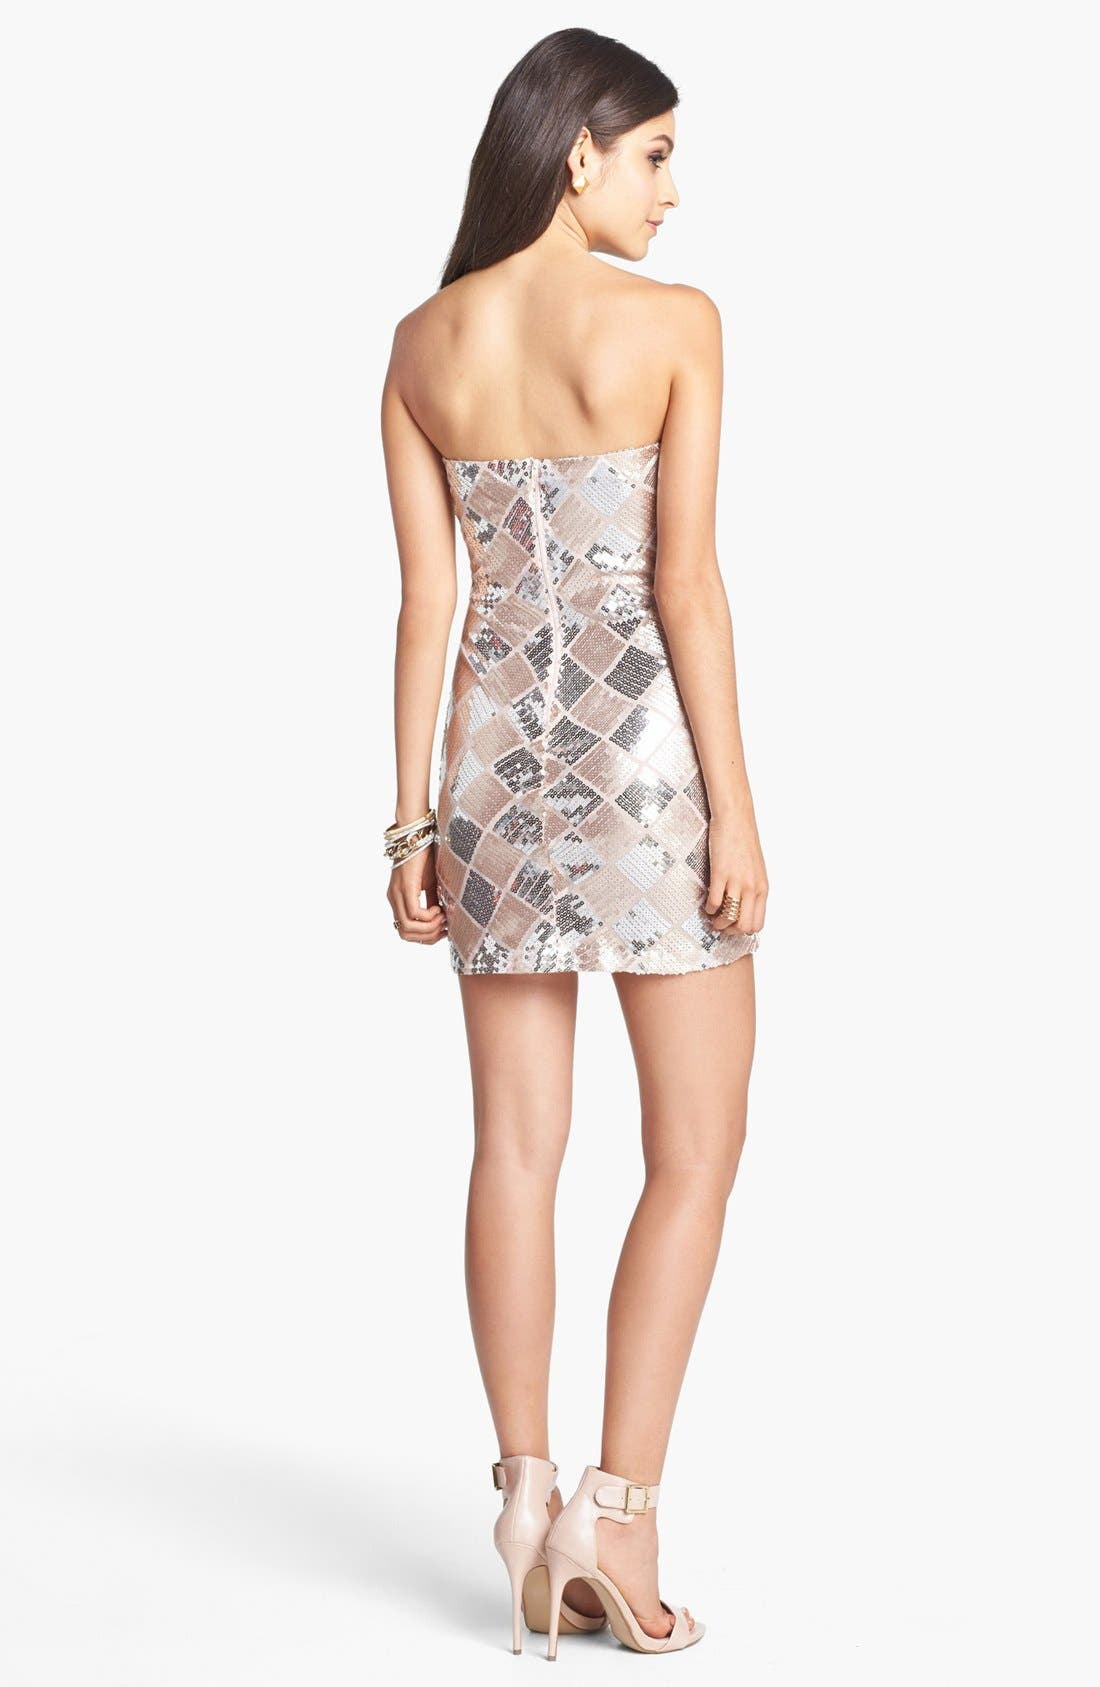 TRIXXI, Checkered Sequin Tube Dress, Alternate thumbnail 2, color, 660